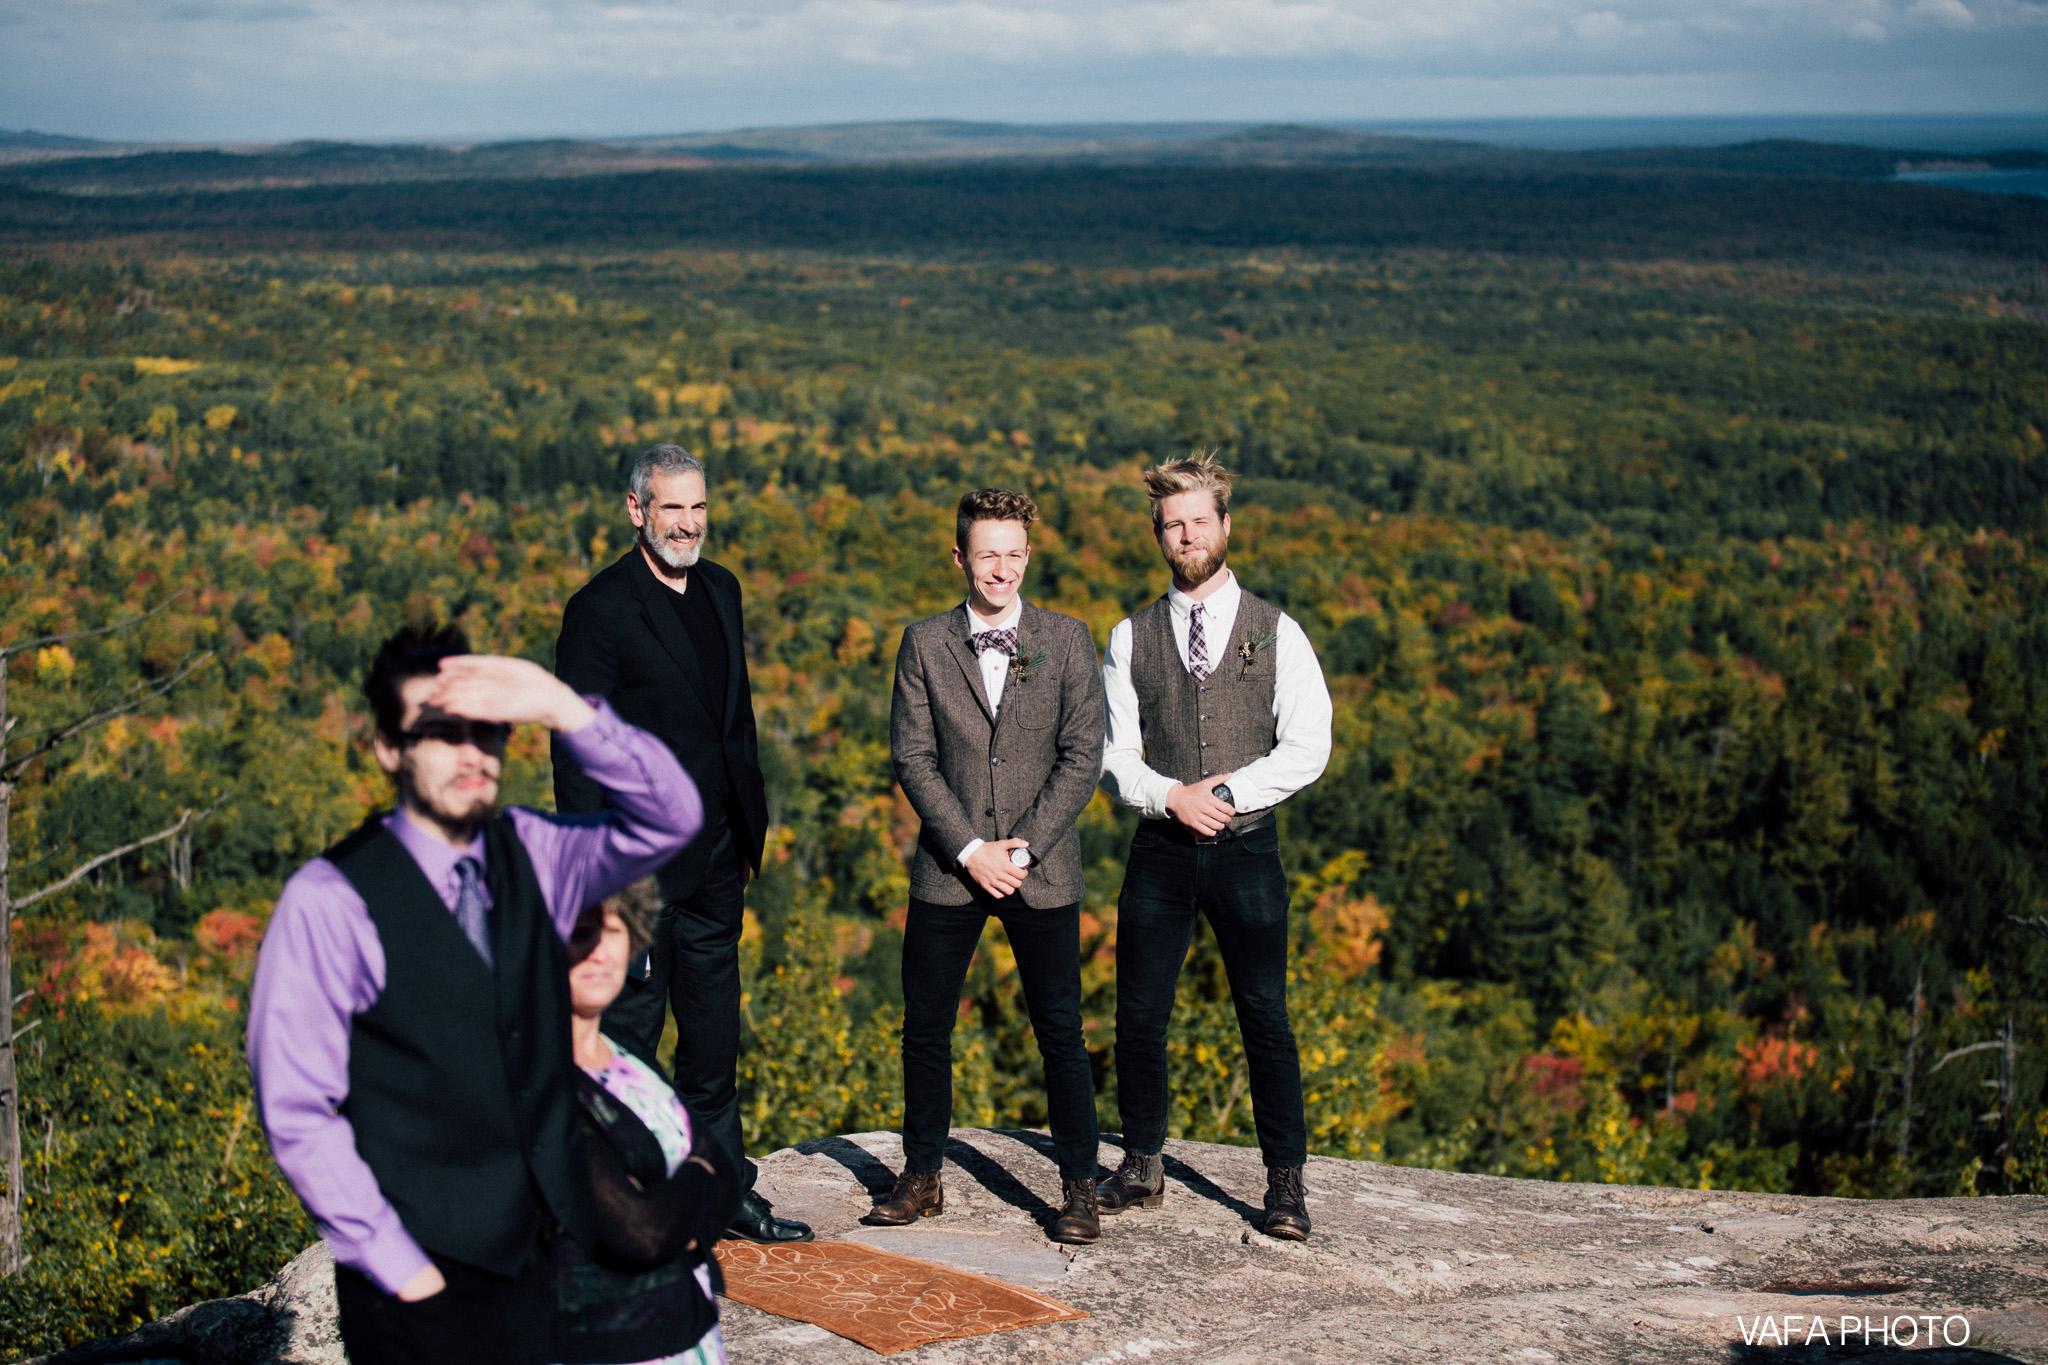 Hogback-Mountain-Wedding-Chelsea-Josh-Vafa-Photo-181.jpg